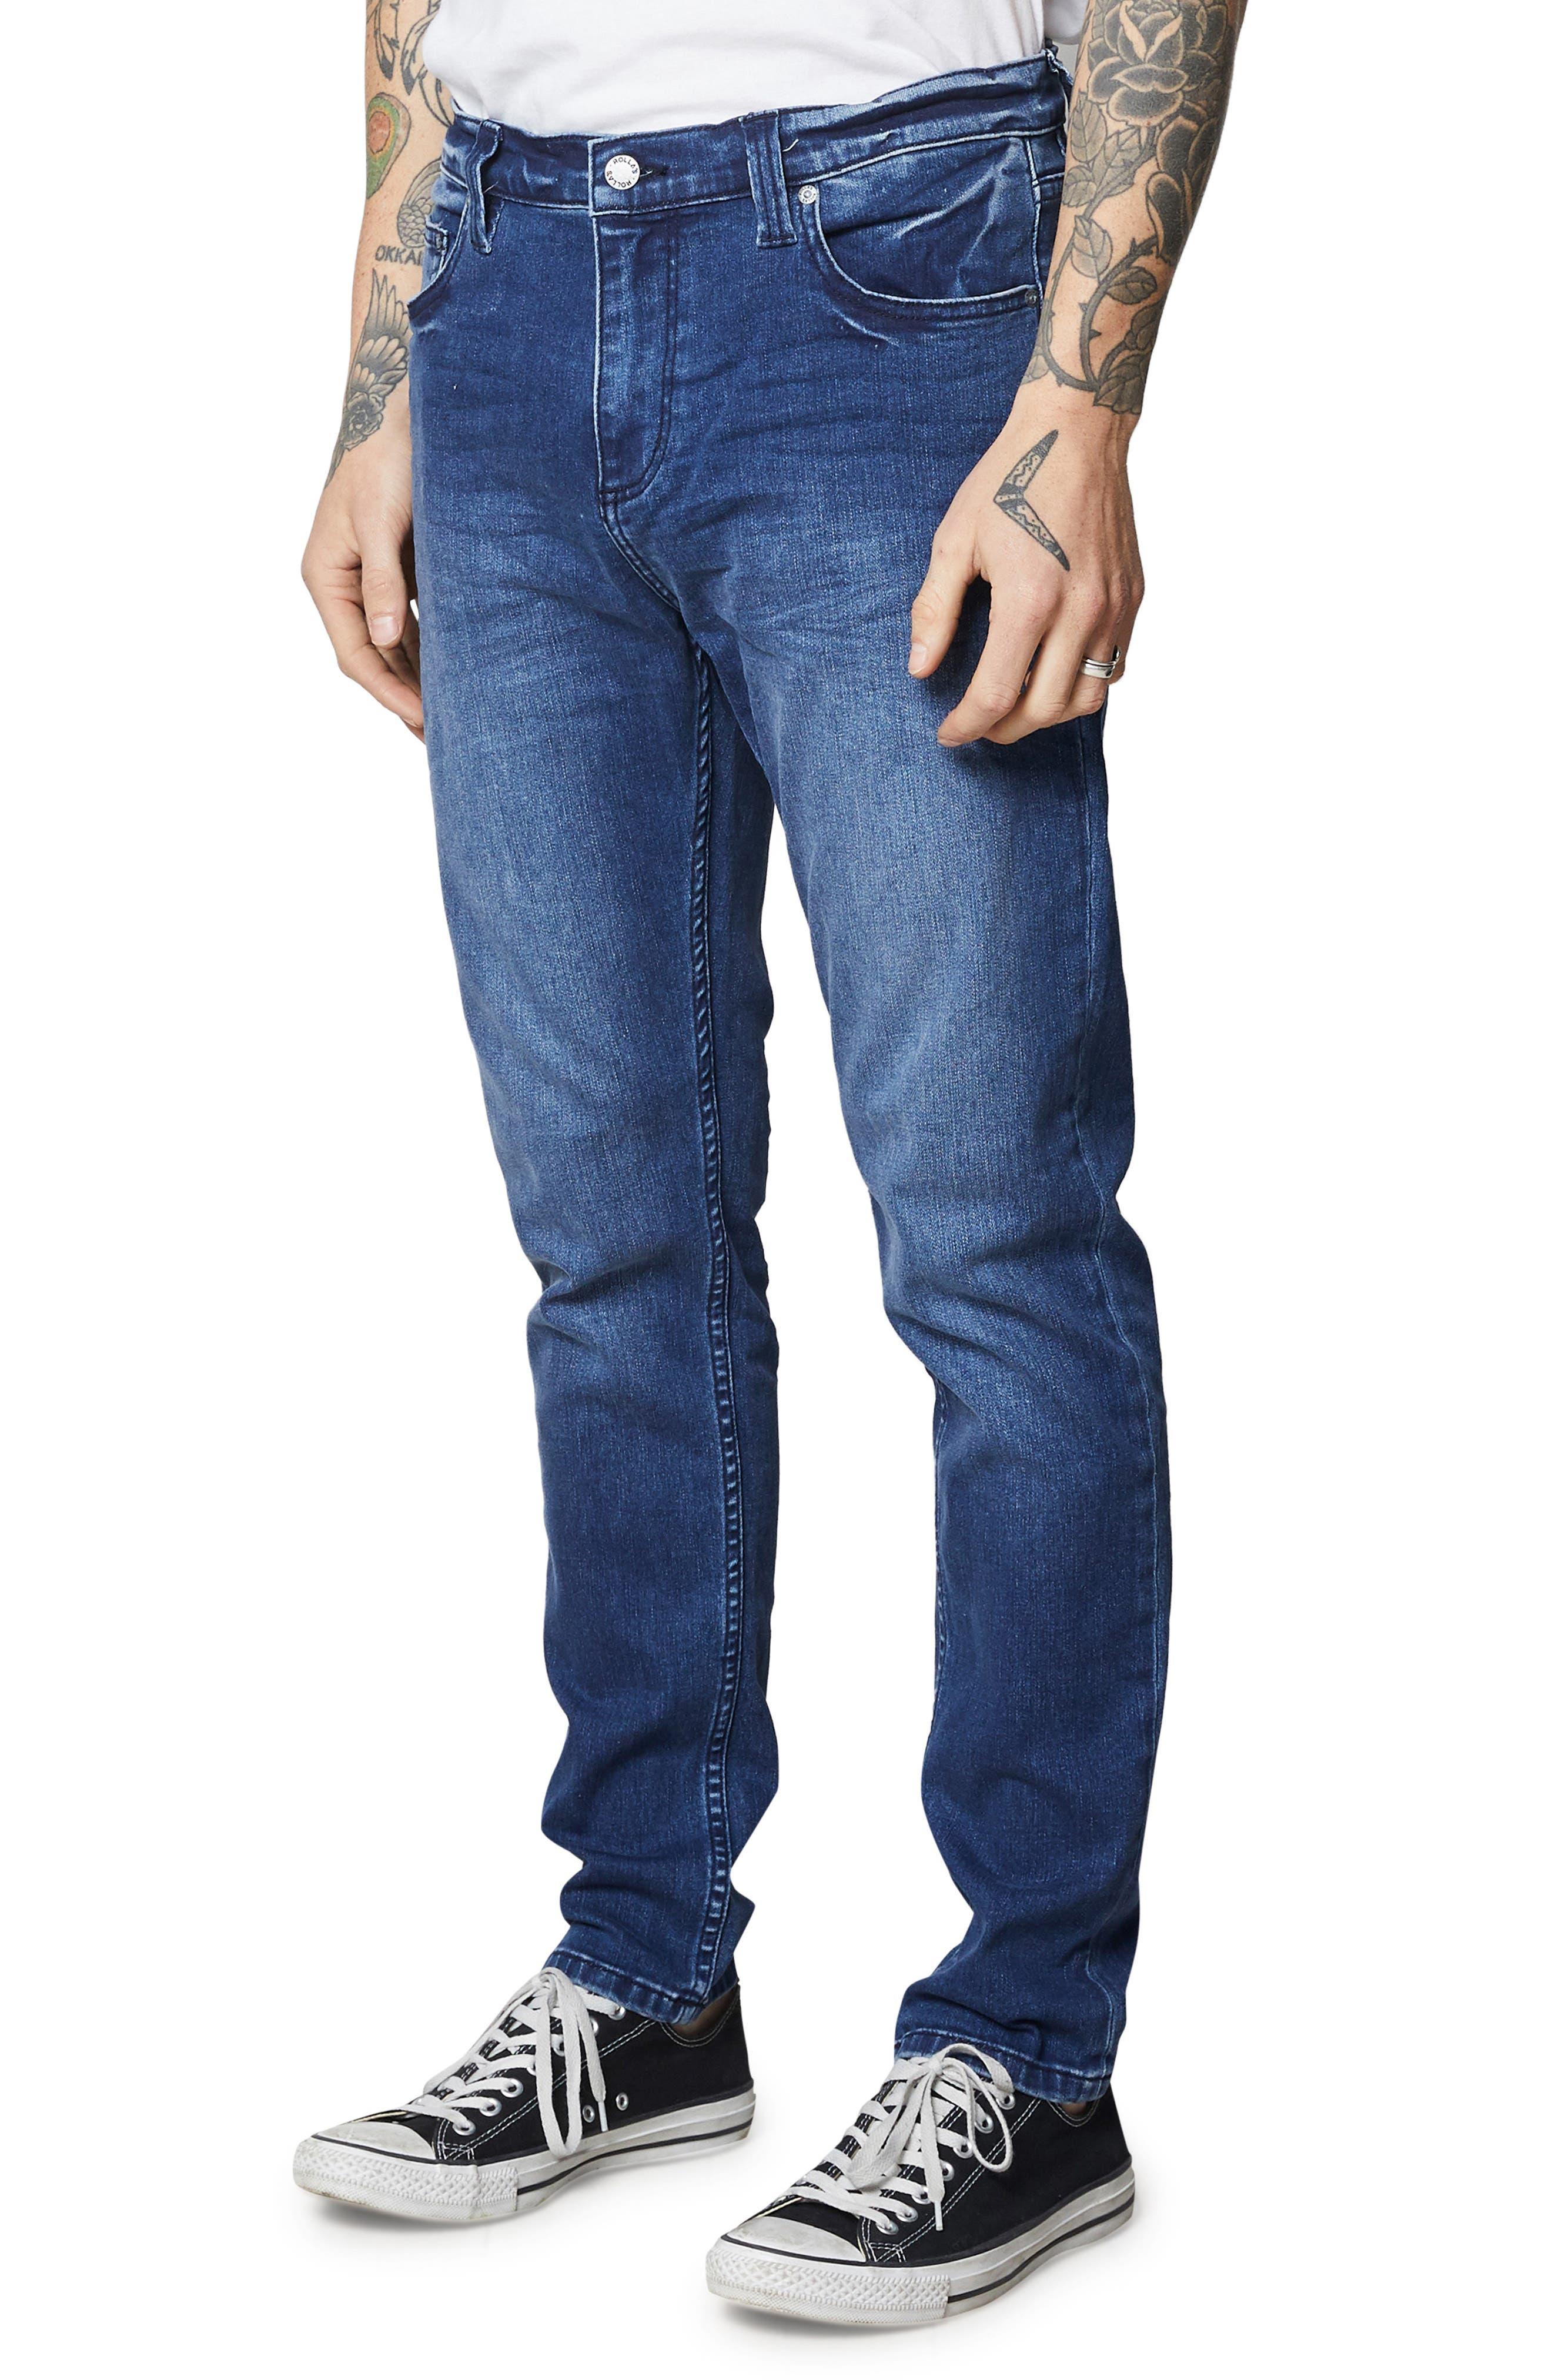 Tim Slims Slim Fit Jeans,                             Alternate thumbnail 3, color,                             FOSTERS BLUE